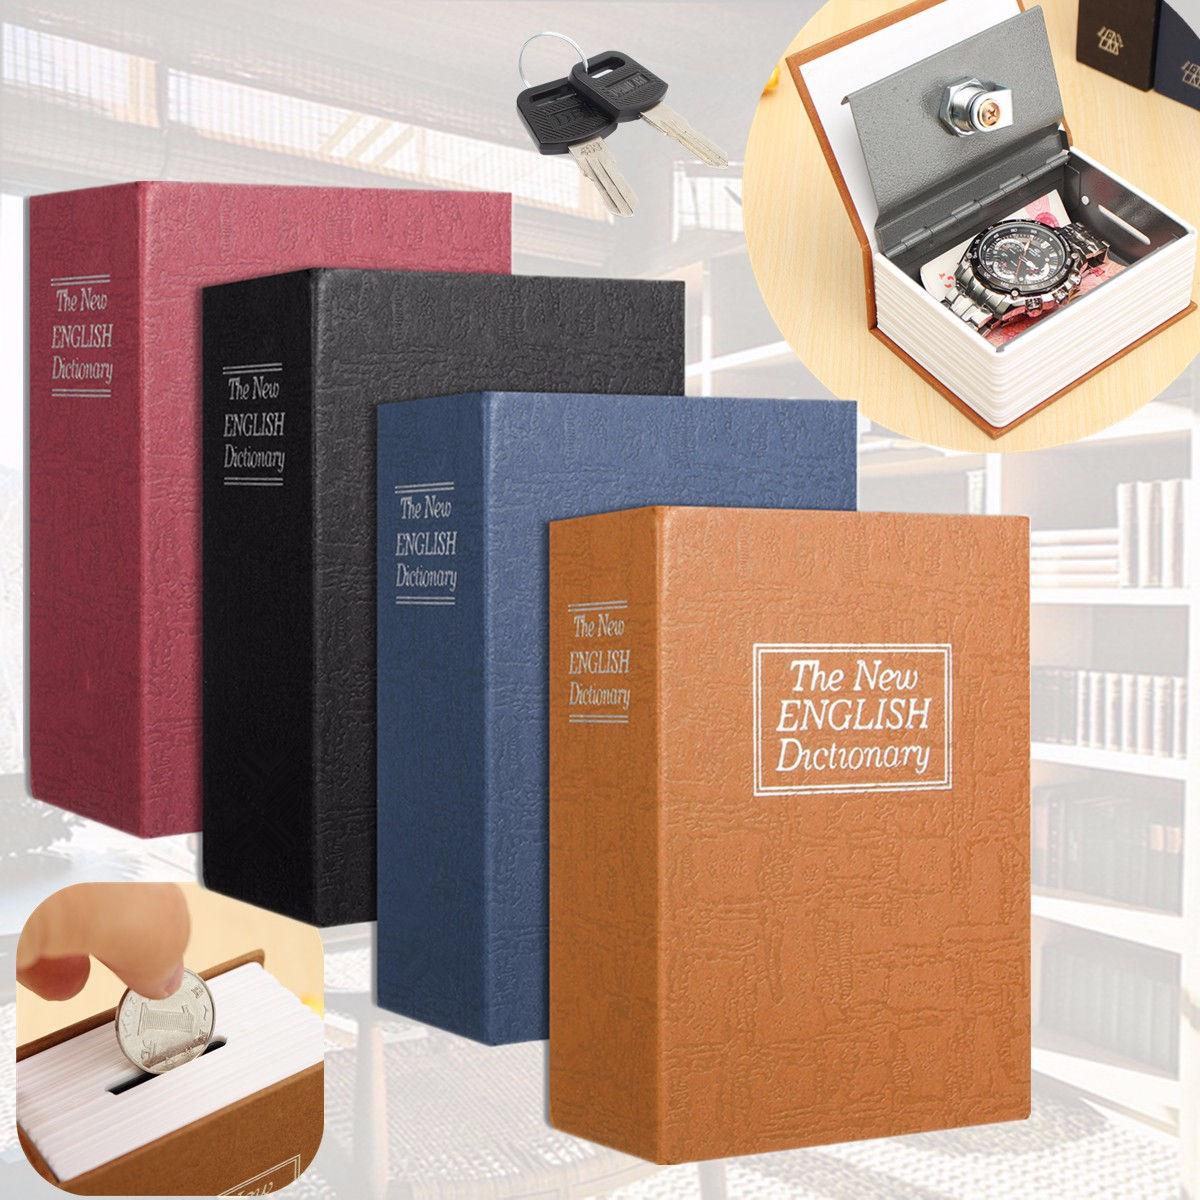 La Mini Brankas Kotak Buku Uang Tersembunyi Rahasia Keamanan Kunci Book Safe Kecil Menyembunyikan Aman Arus Koin Penyimpanan Perhiasan